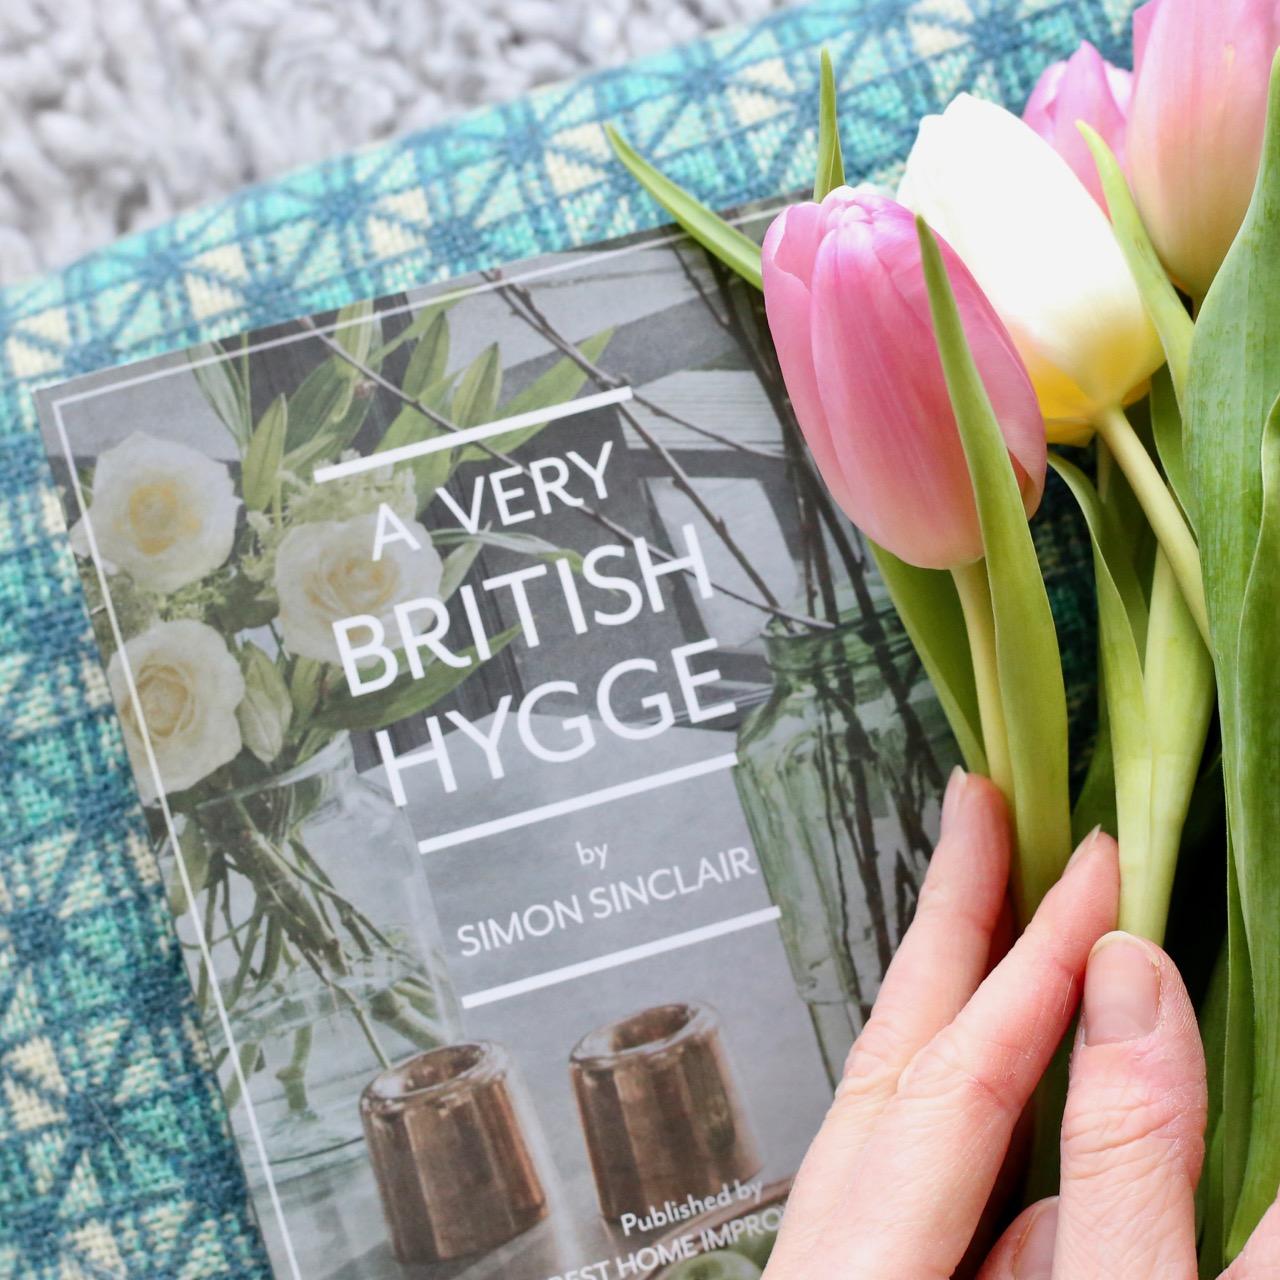 A Very British Hygge by Simon Sinclair